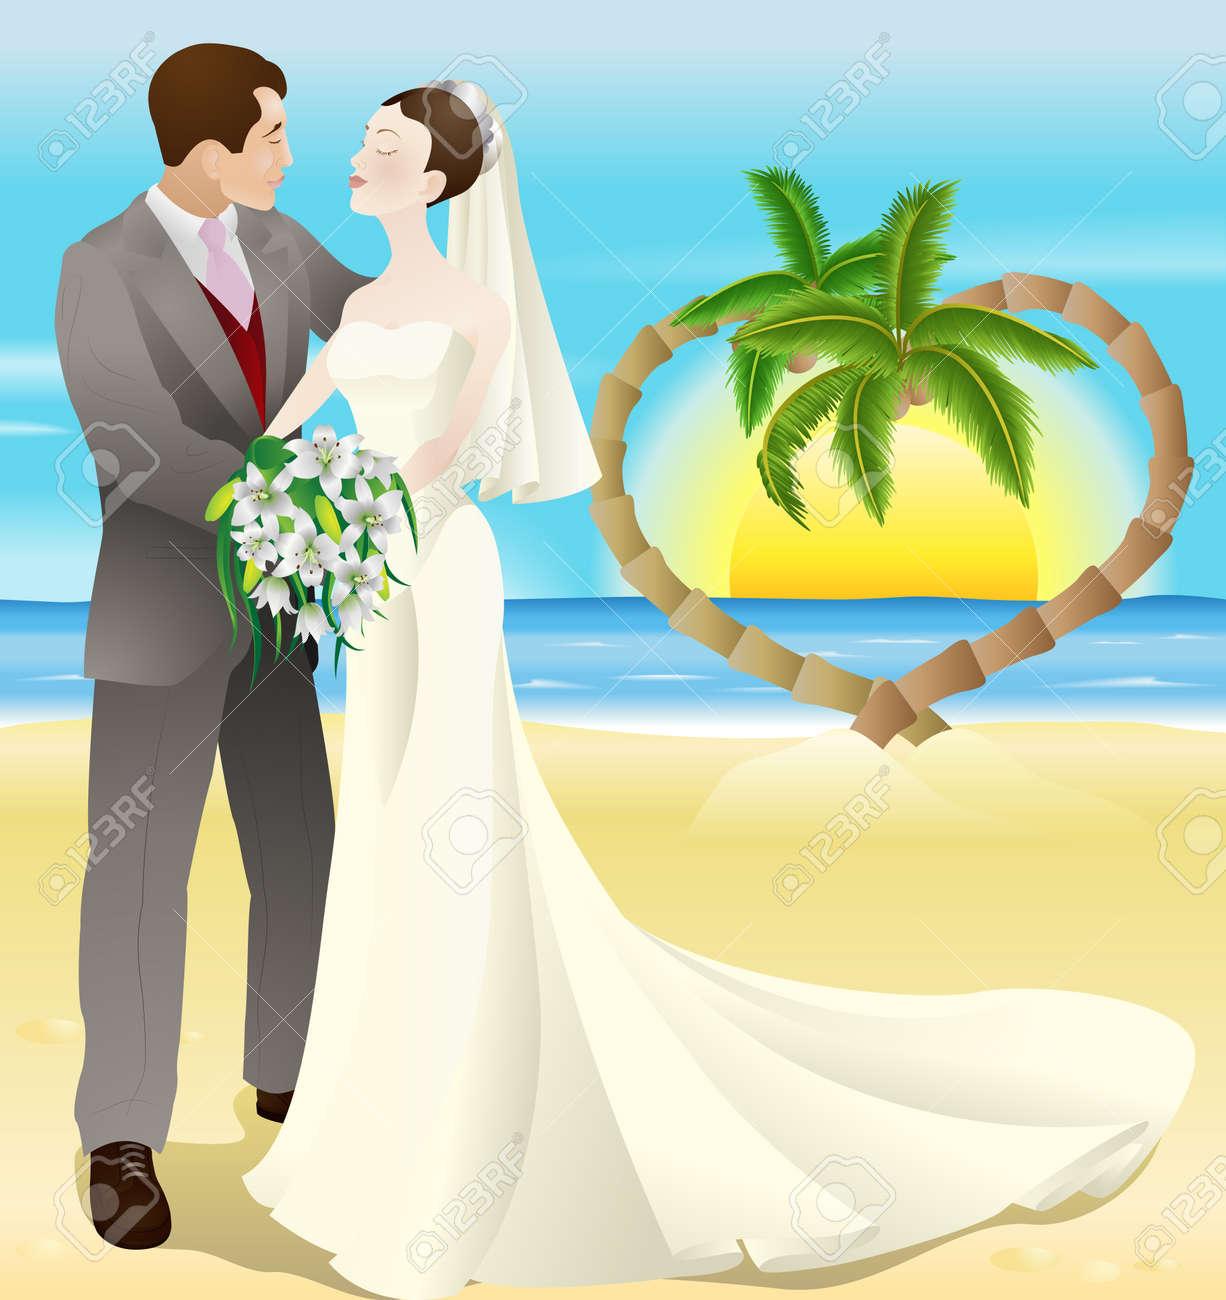 A Tropical Destination Beach Wedding Illustration Bride And Groom Newly Wed On